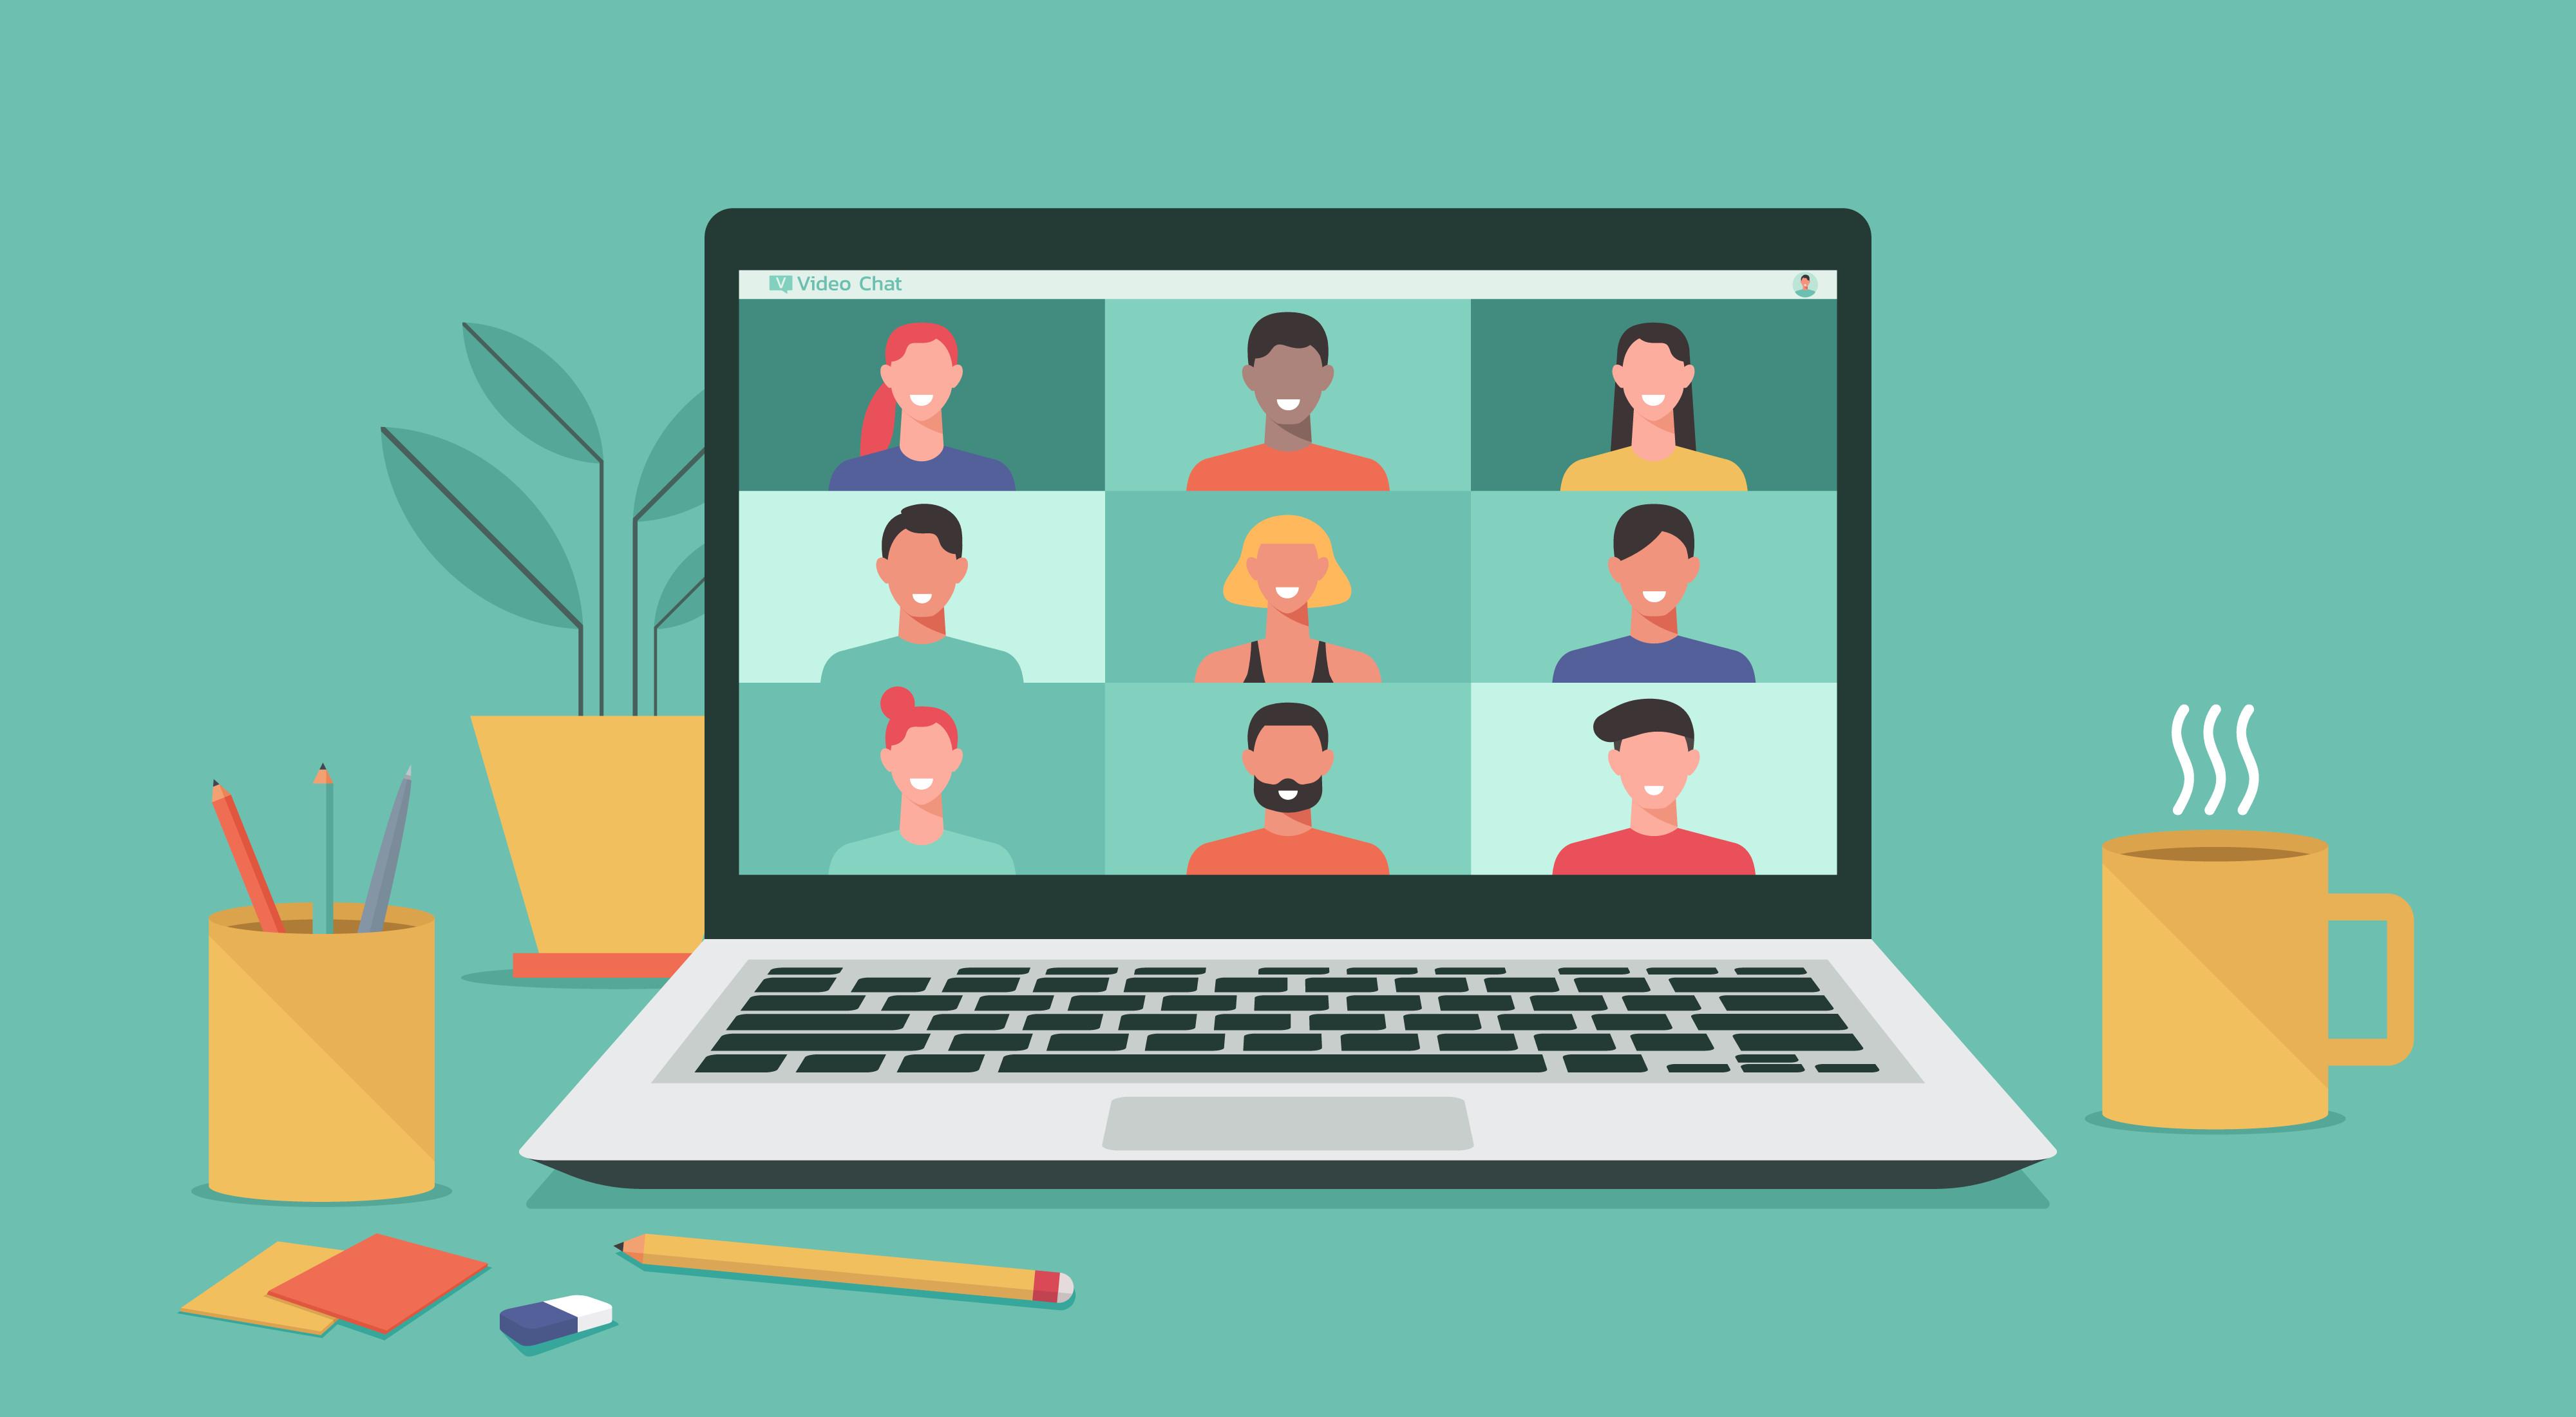 1 - 1 Online Meeting